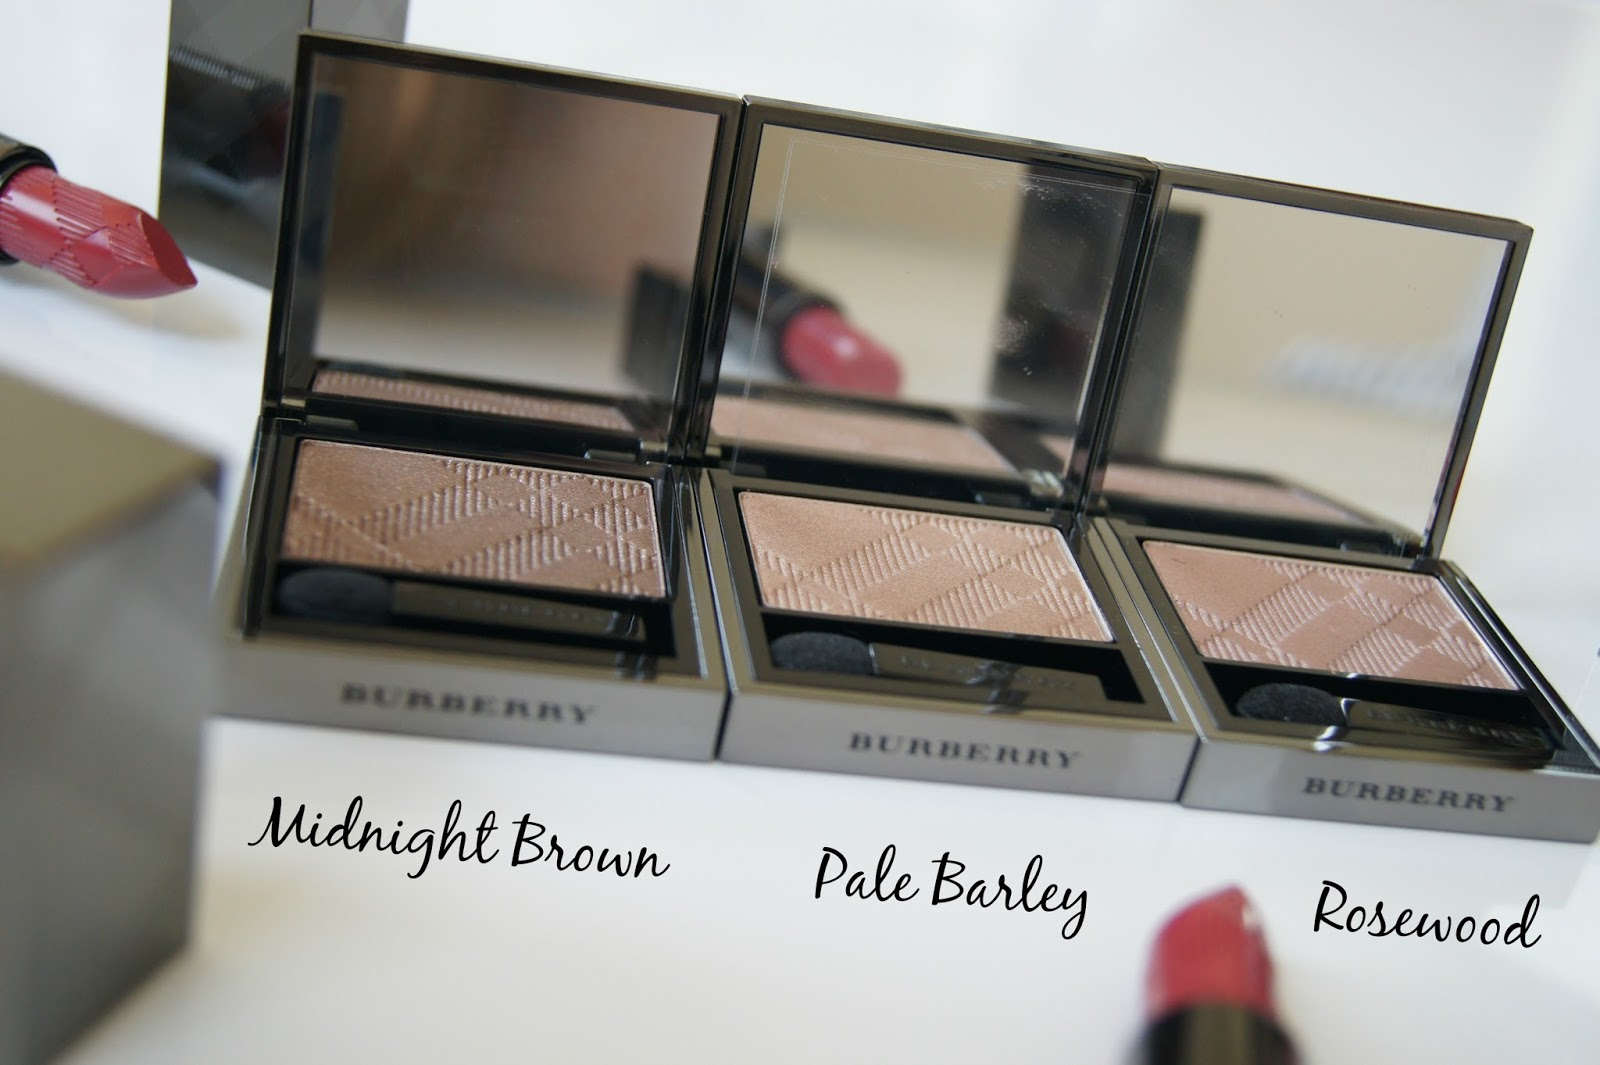 Burberry Sheer Eyeshadow review-Midnight Brown, Pale Barley, Rosewood